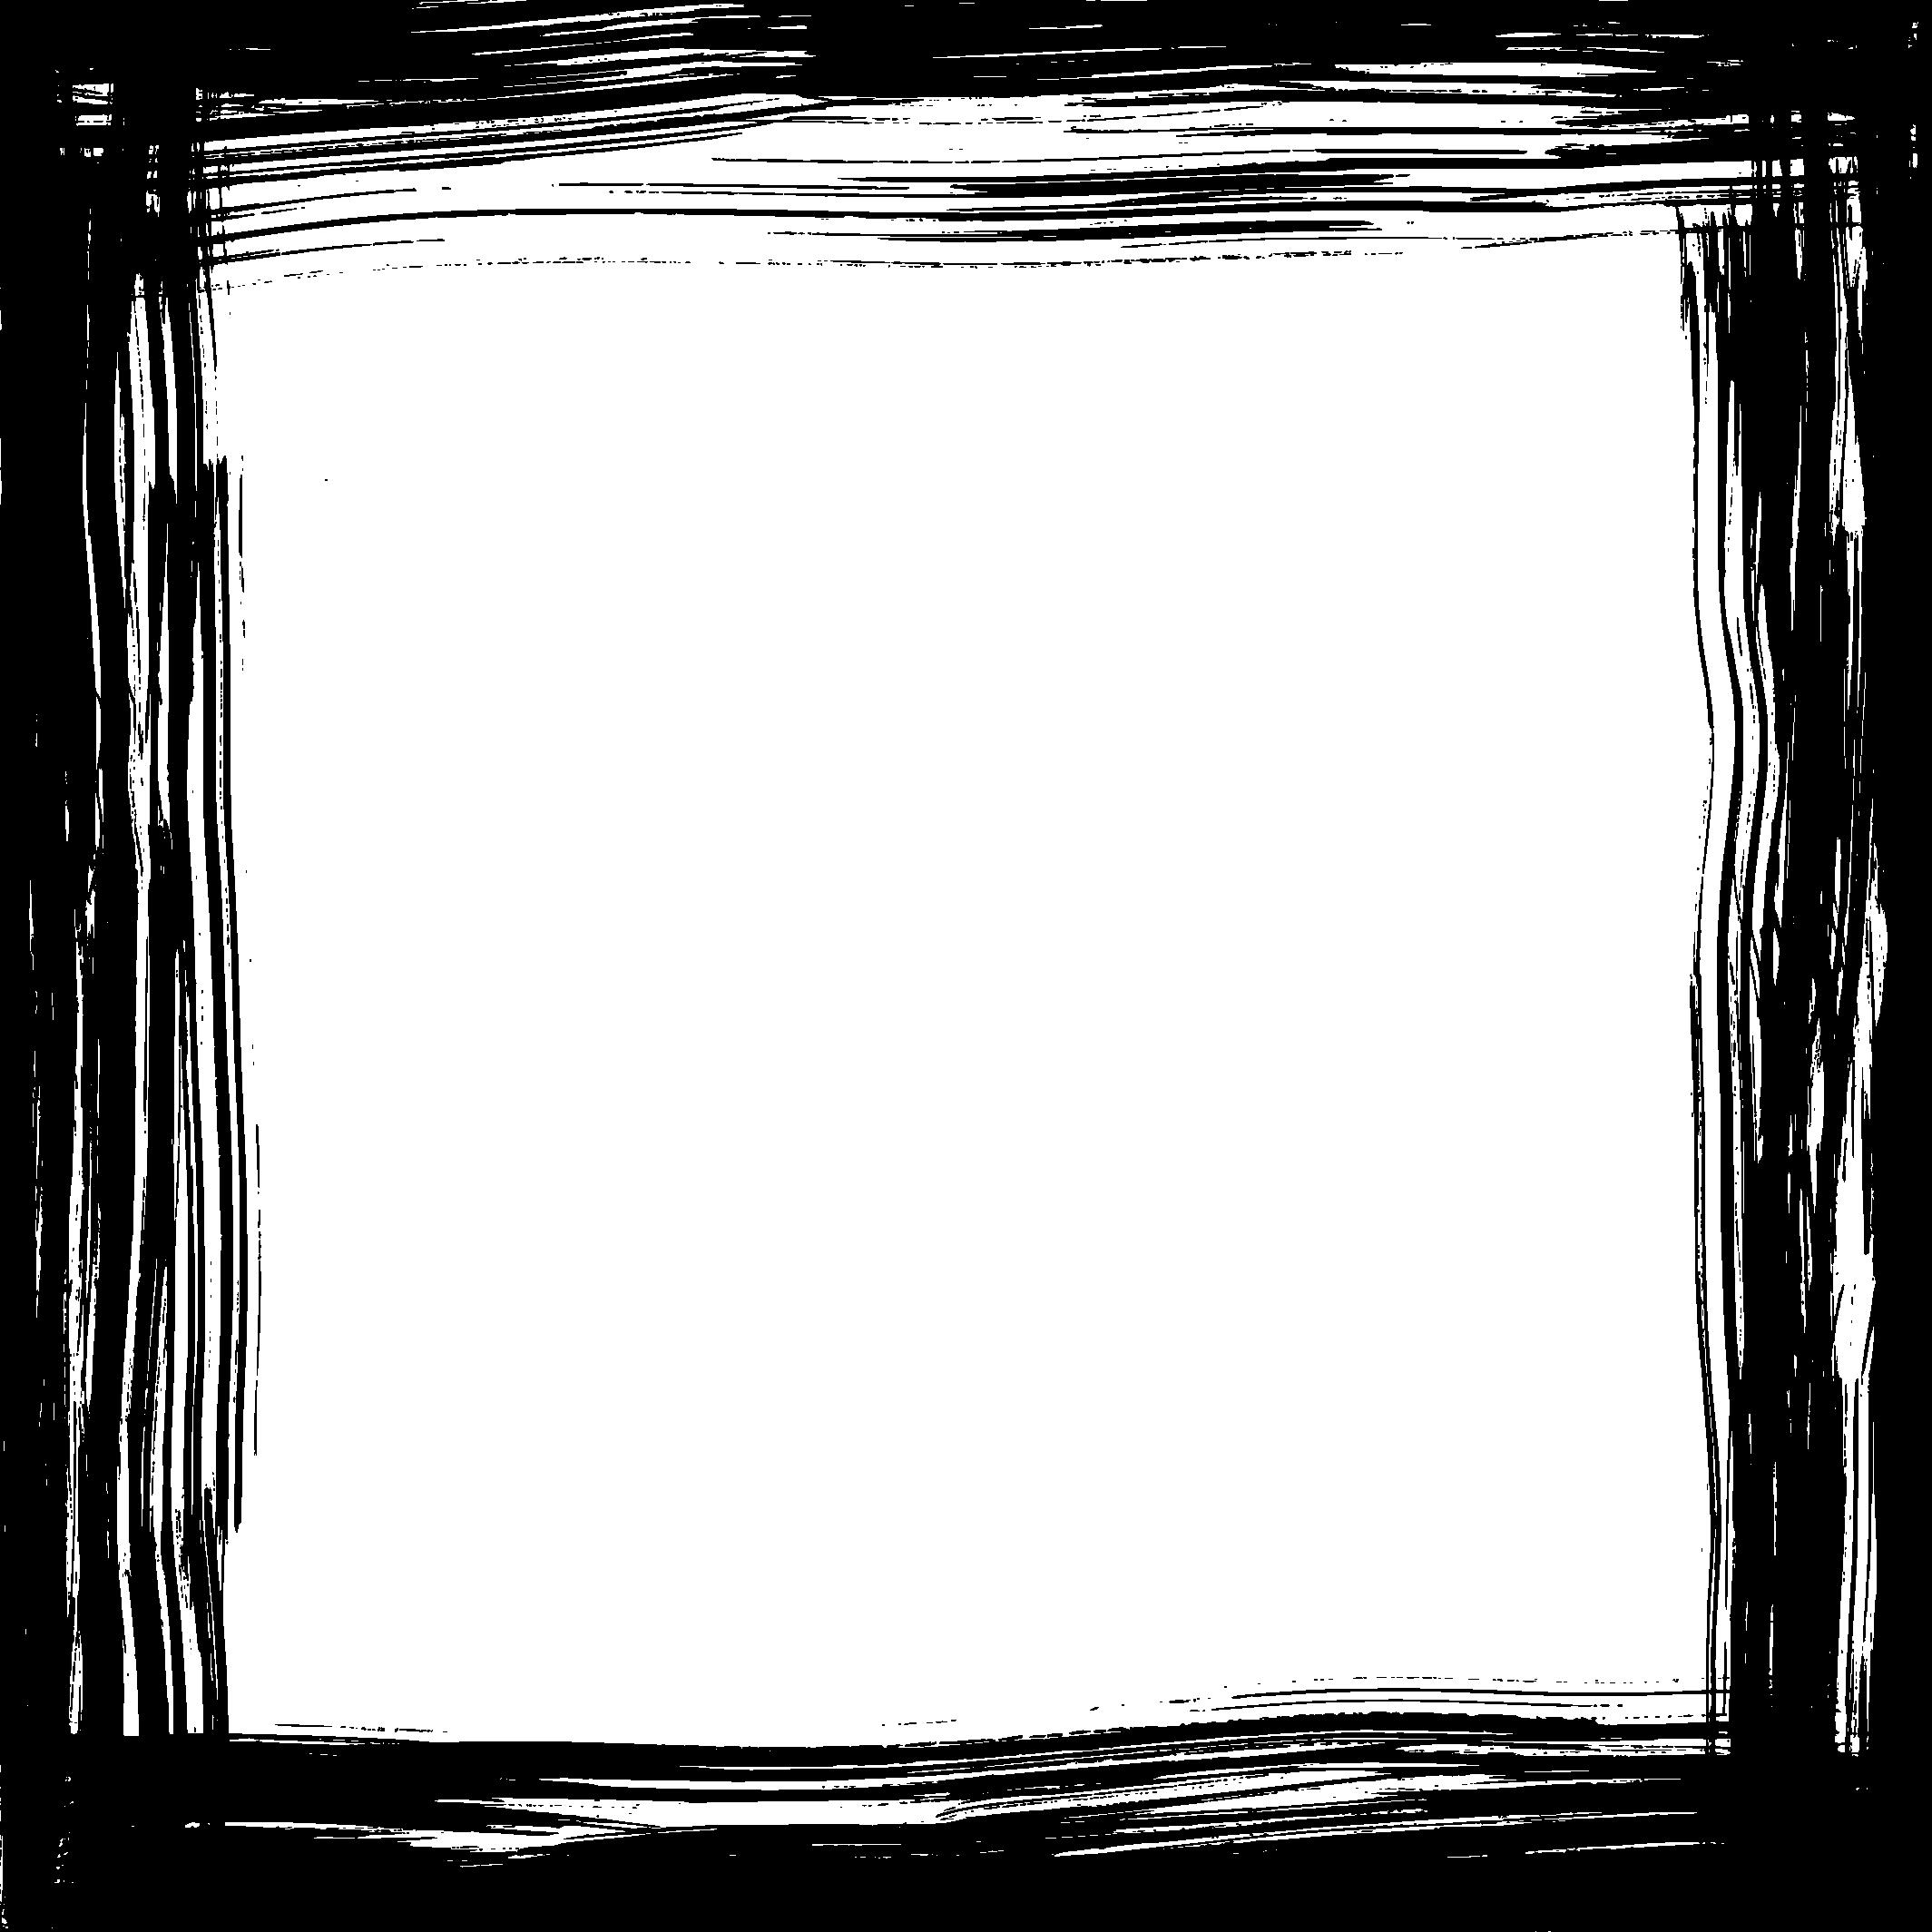 transparent black border - 880×880